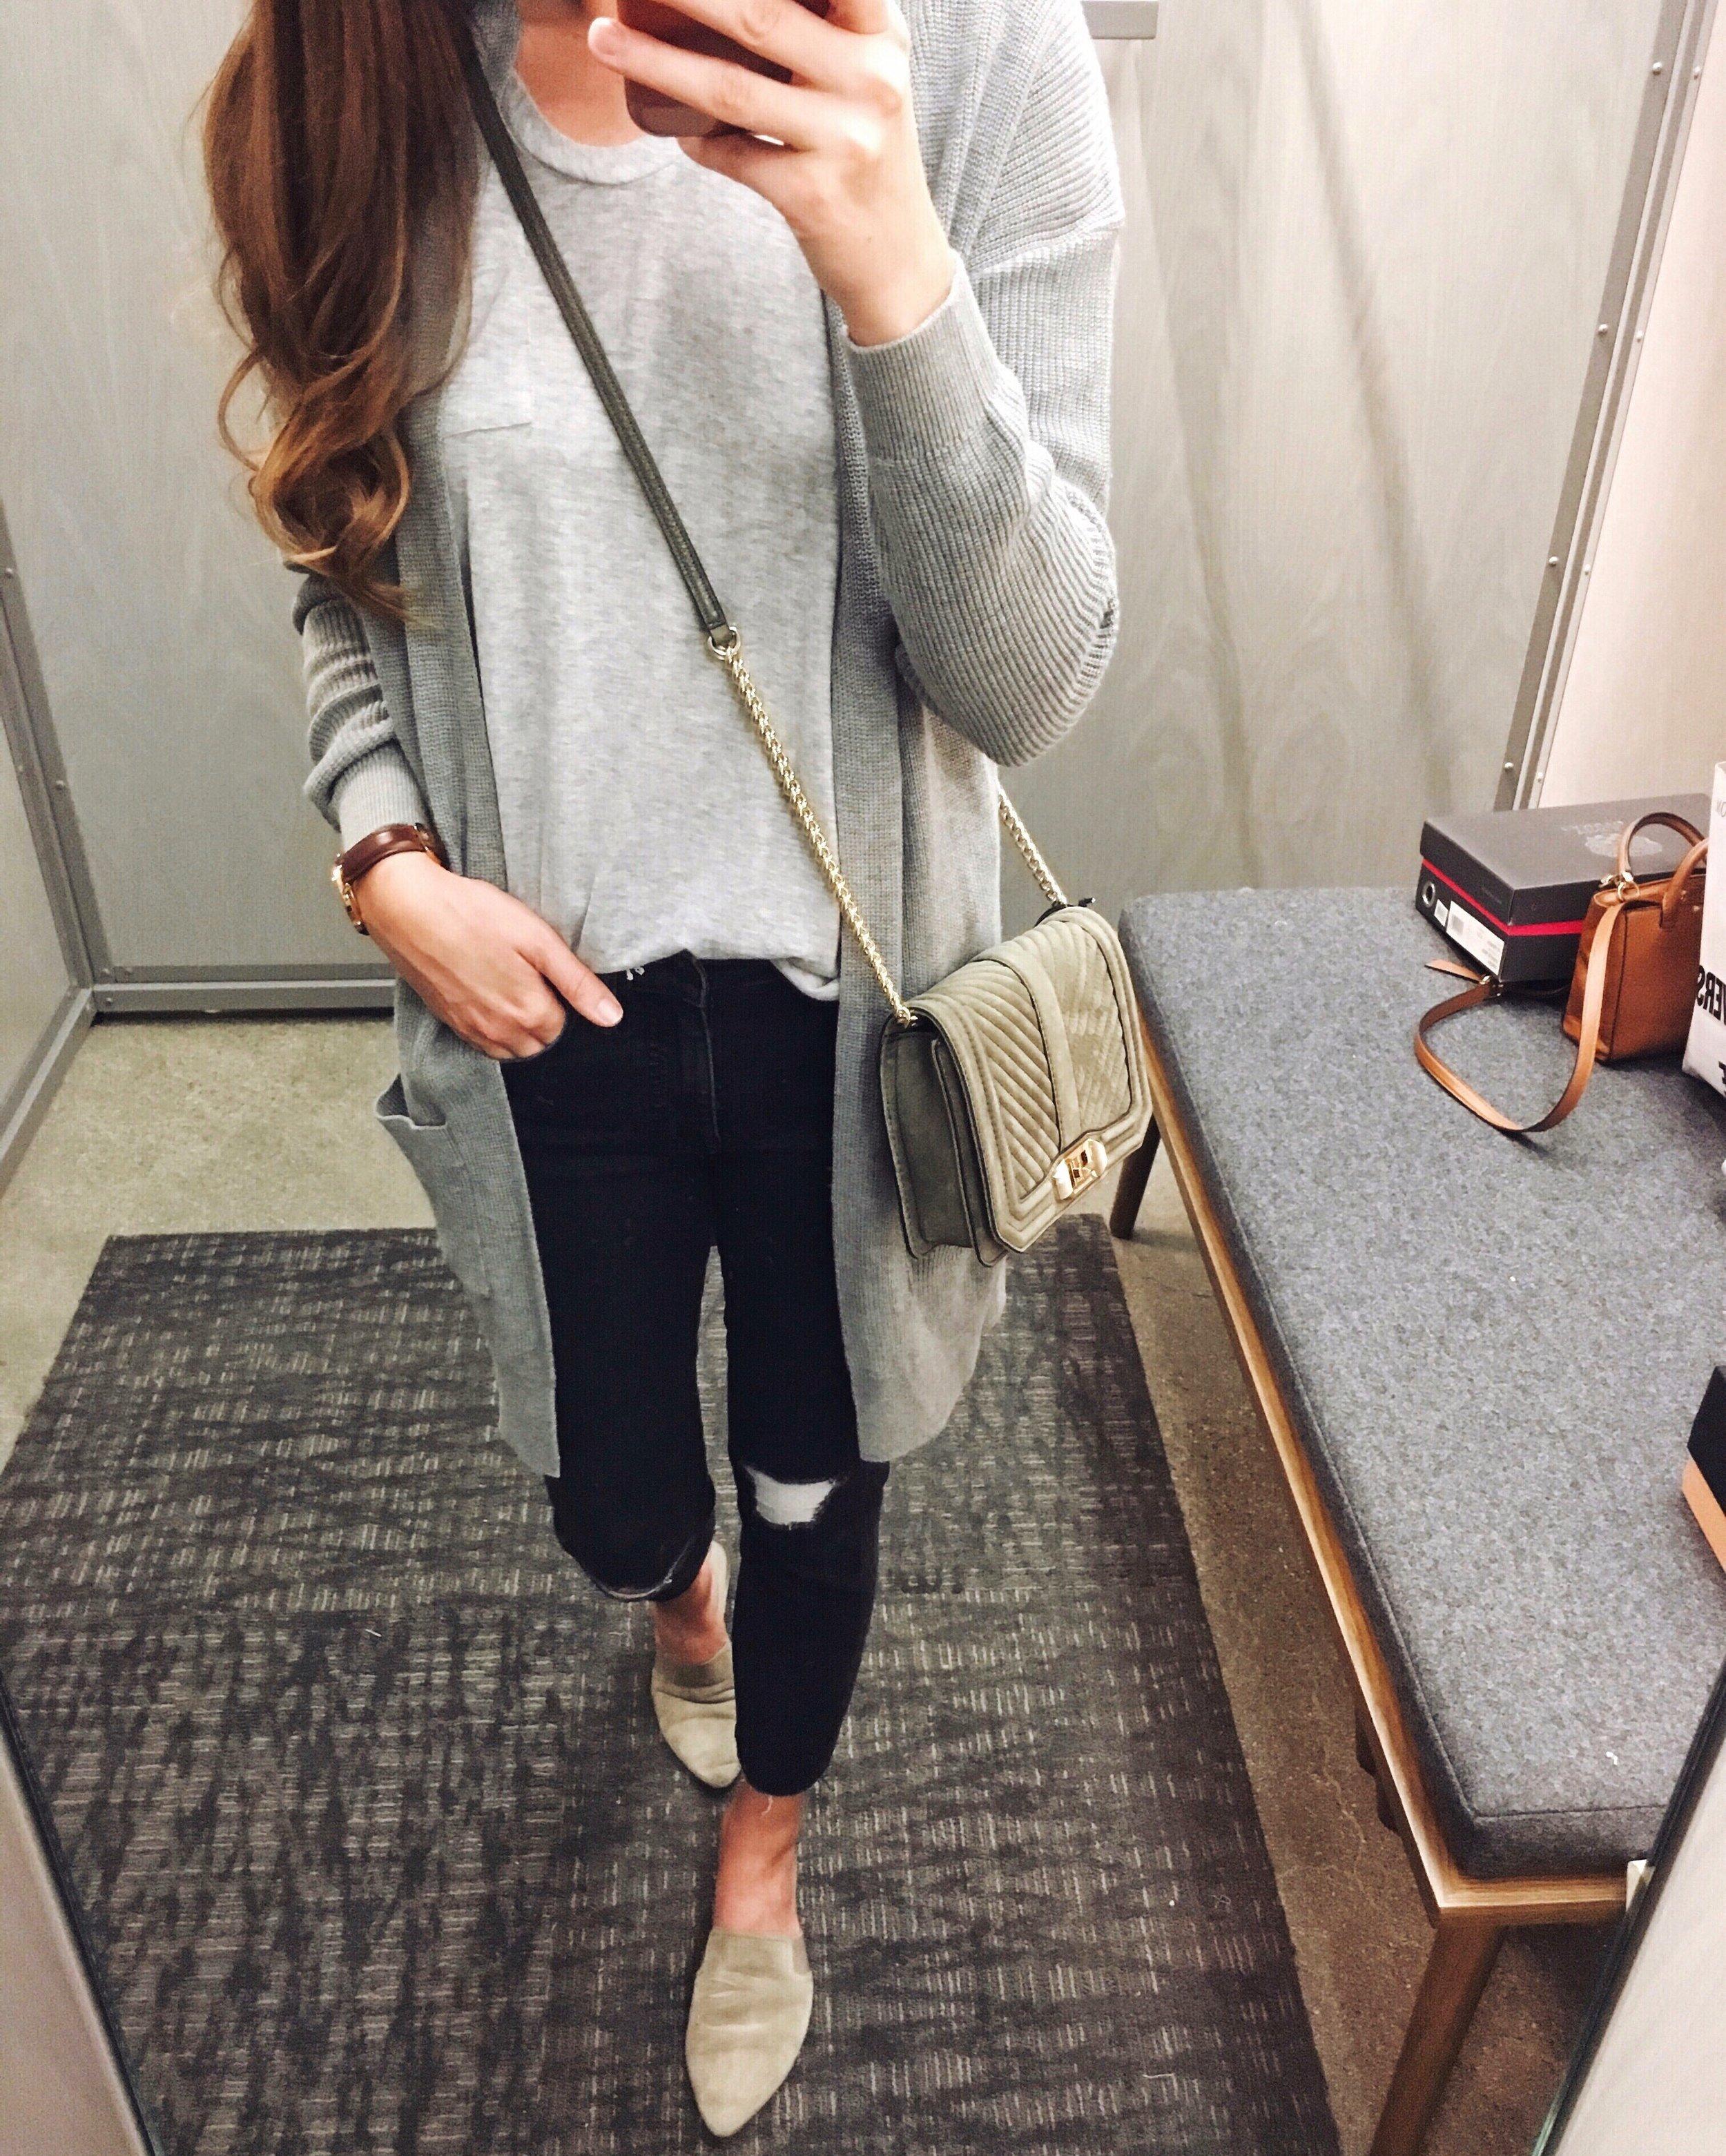 BP Cardigan  |  Madewell Jeans  |  Rebecca Minkoff Bag  |  Nordstrom Tee